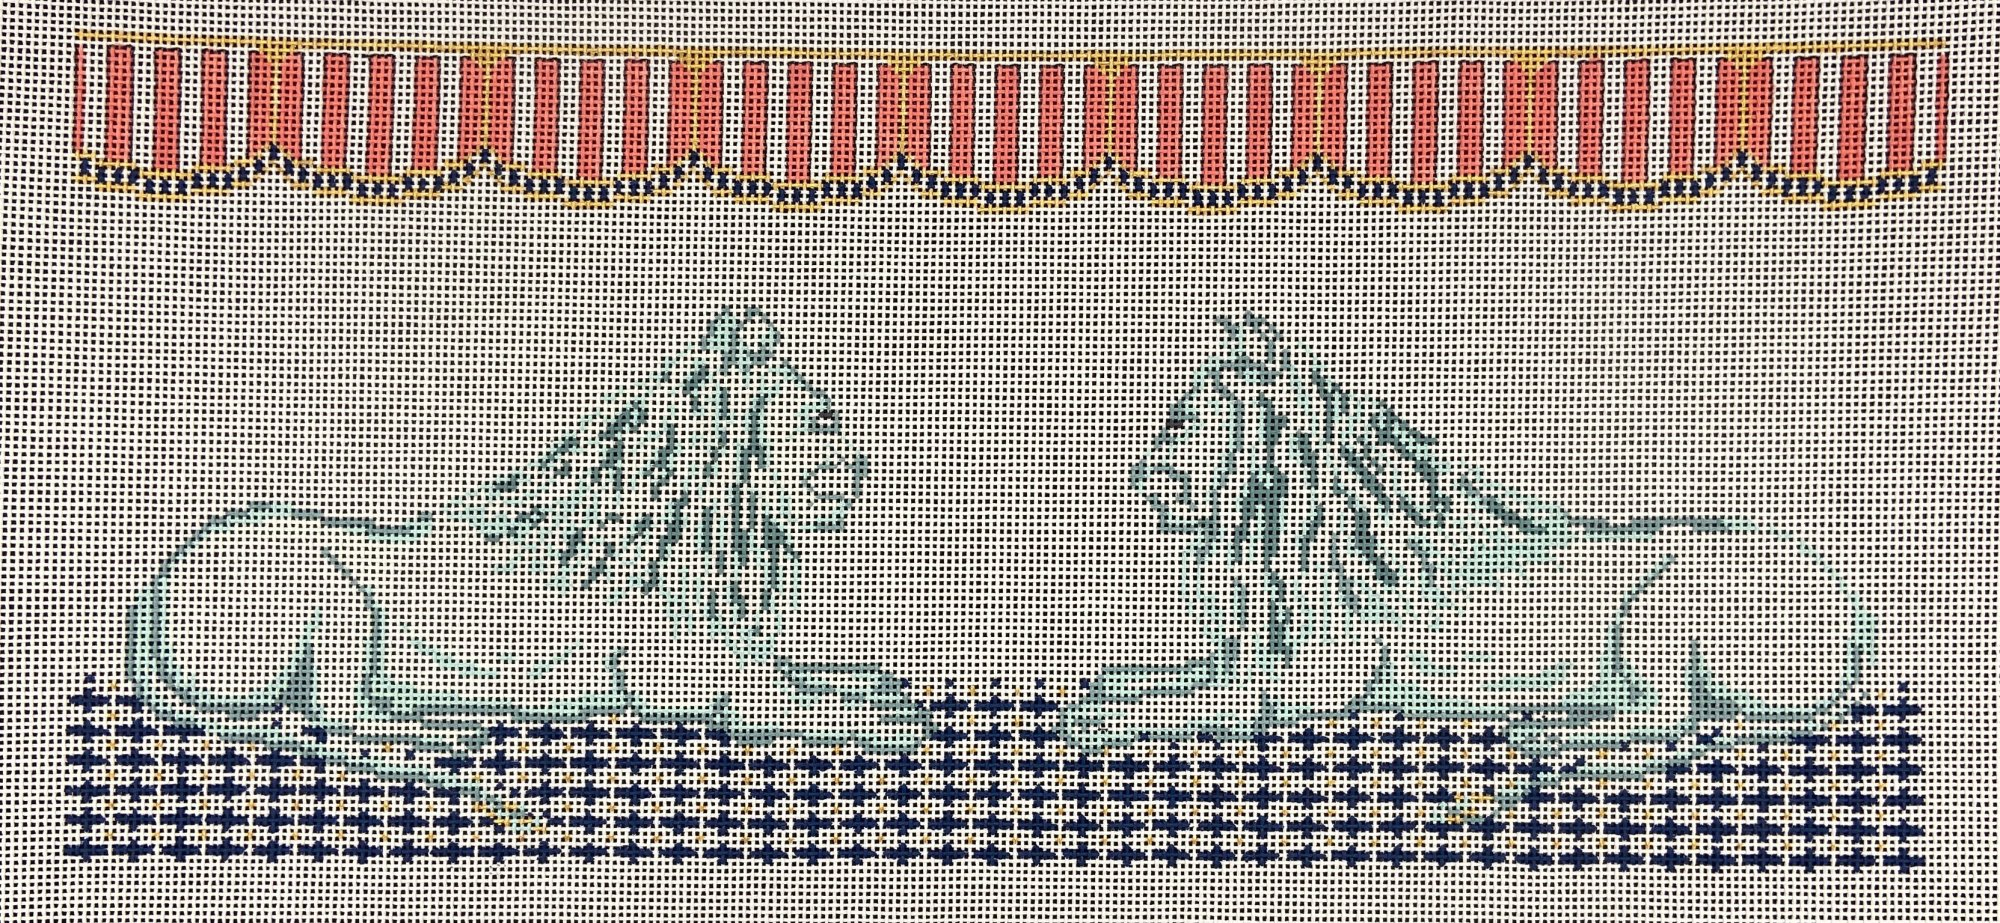 PS15II Staring Contest Lions Pillow Plum Stitchery